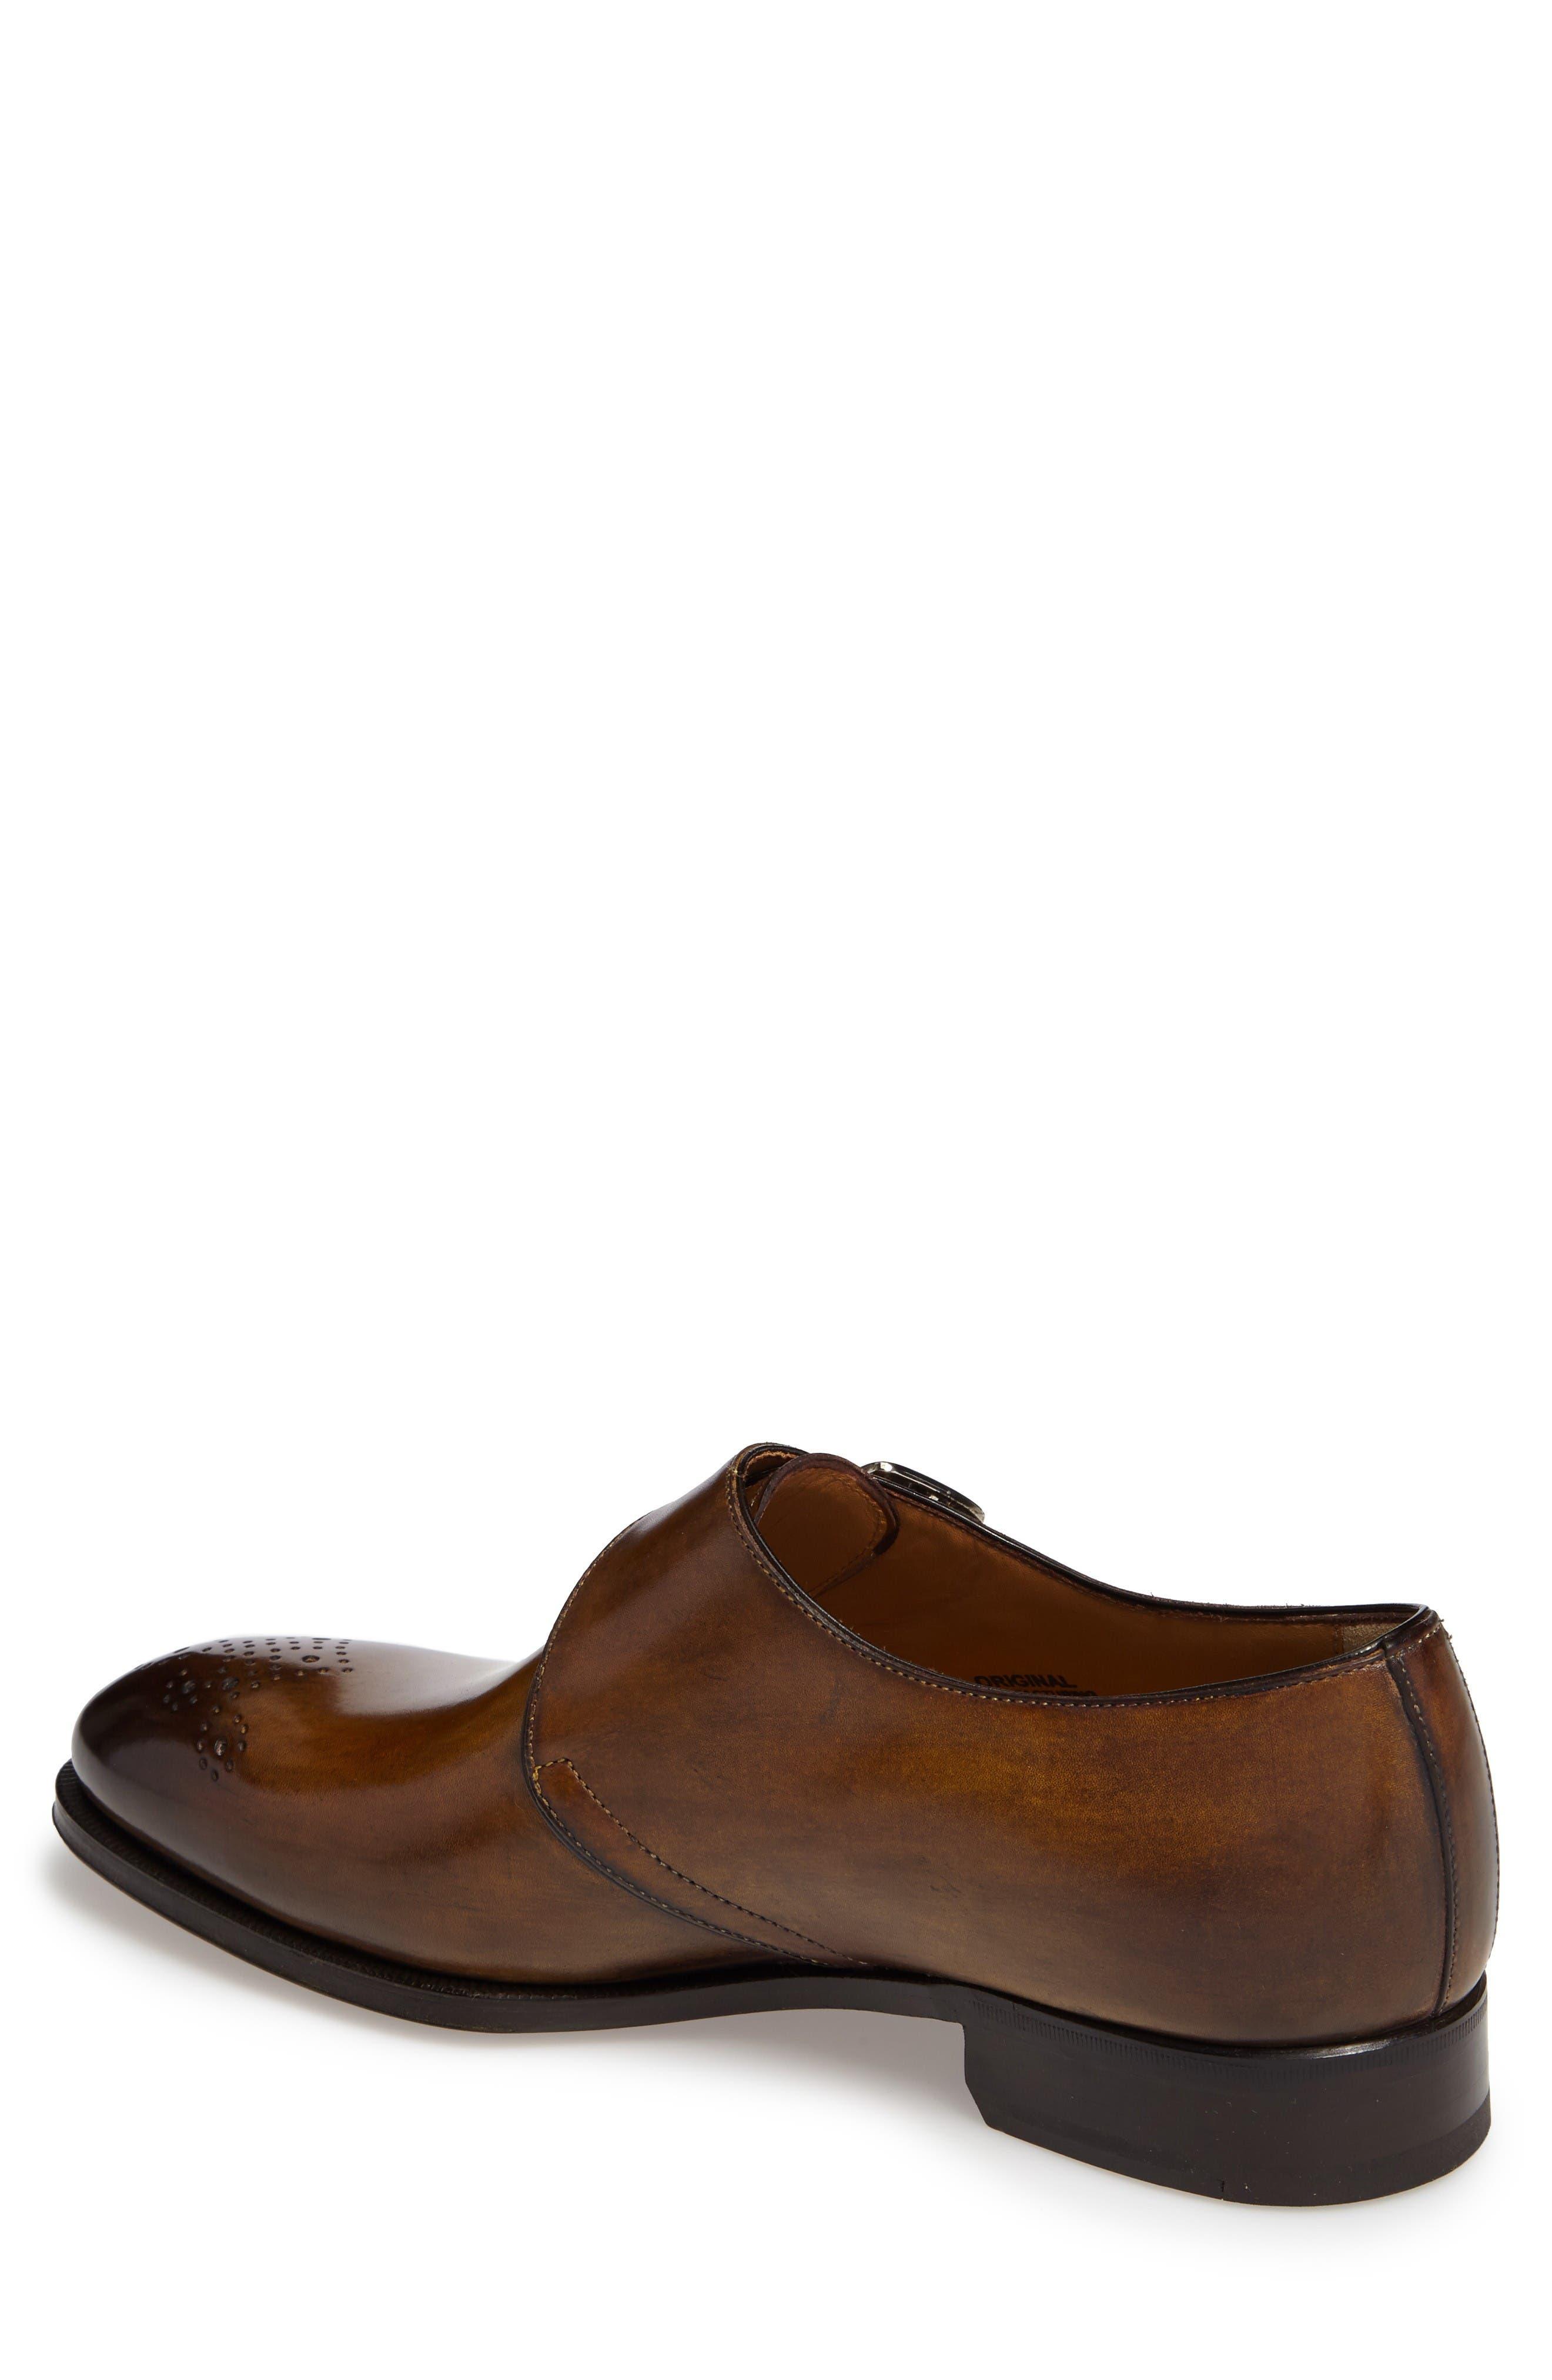 Blake Monk Strap Shoe,                             Alternate thumbnail 2, color,                             Reverse Sombrero